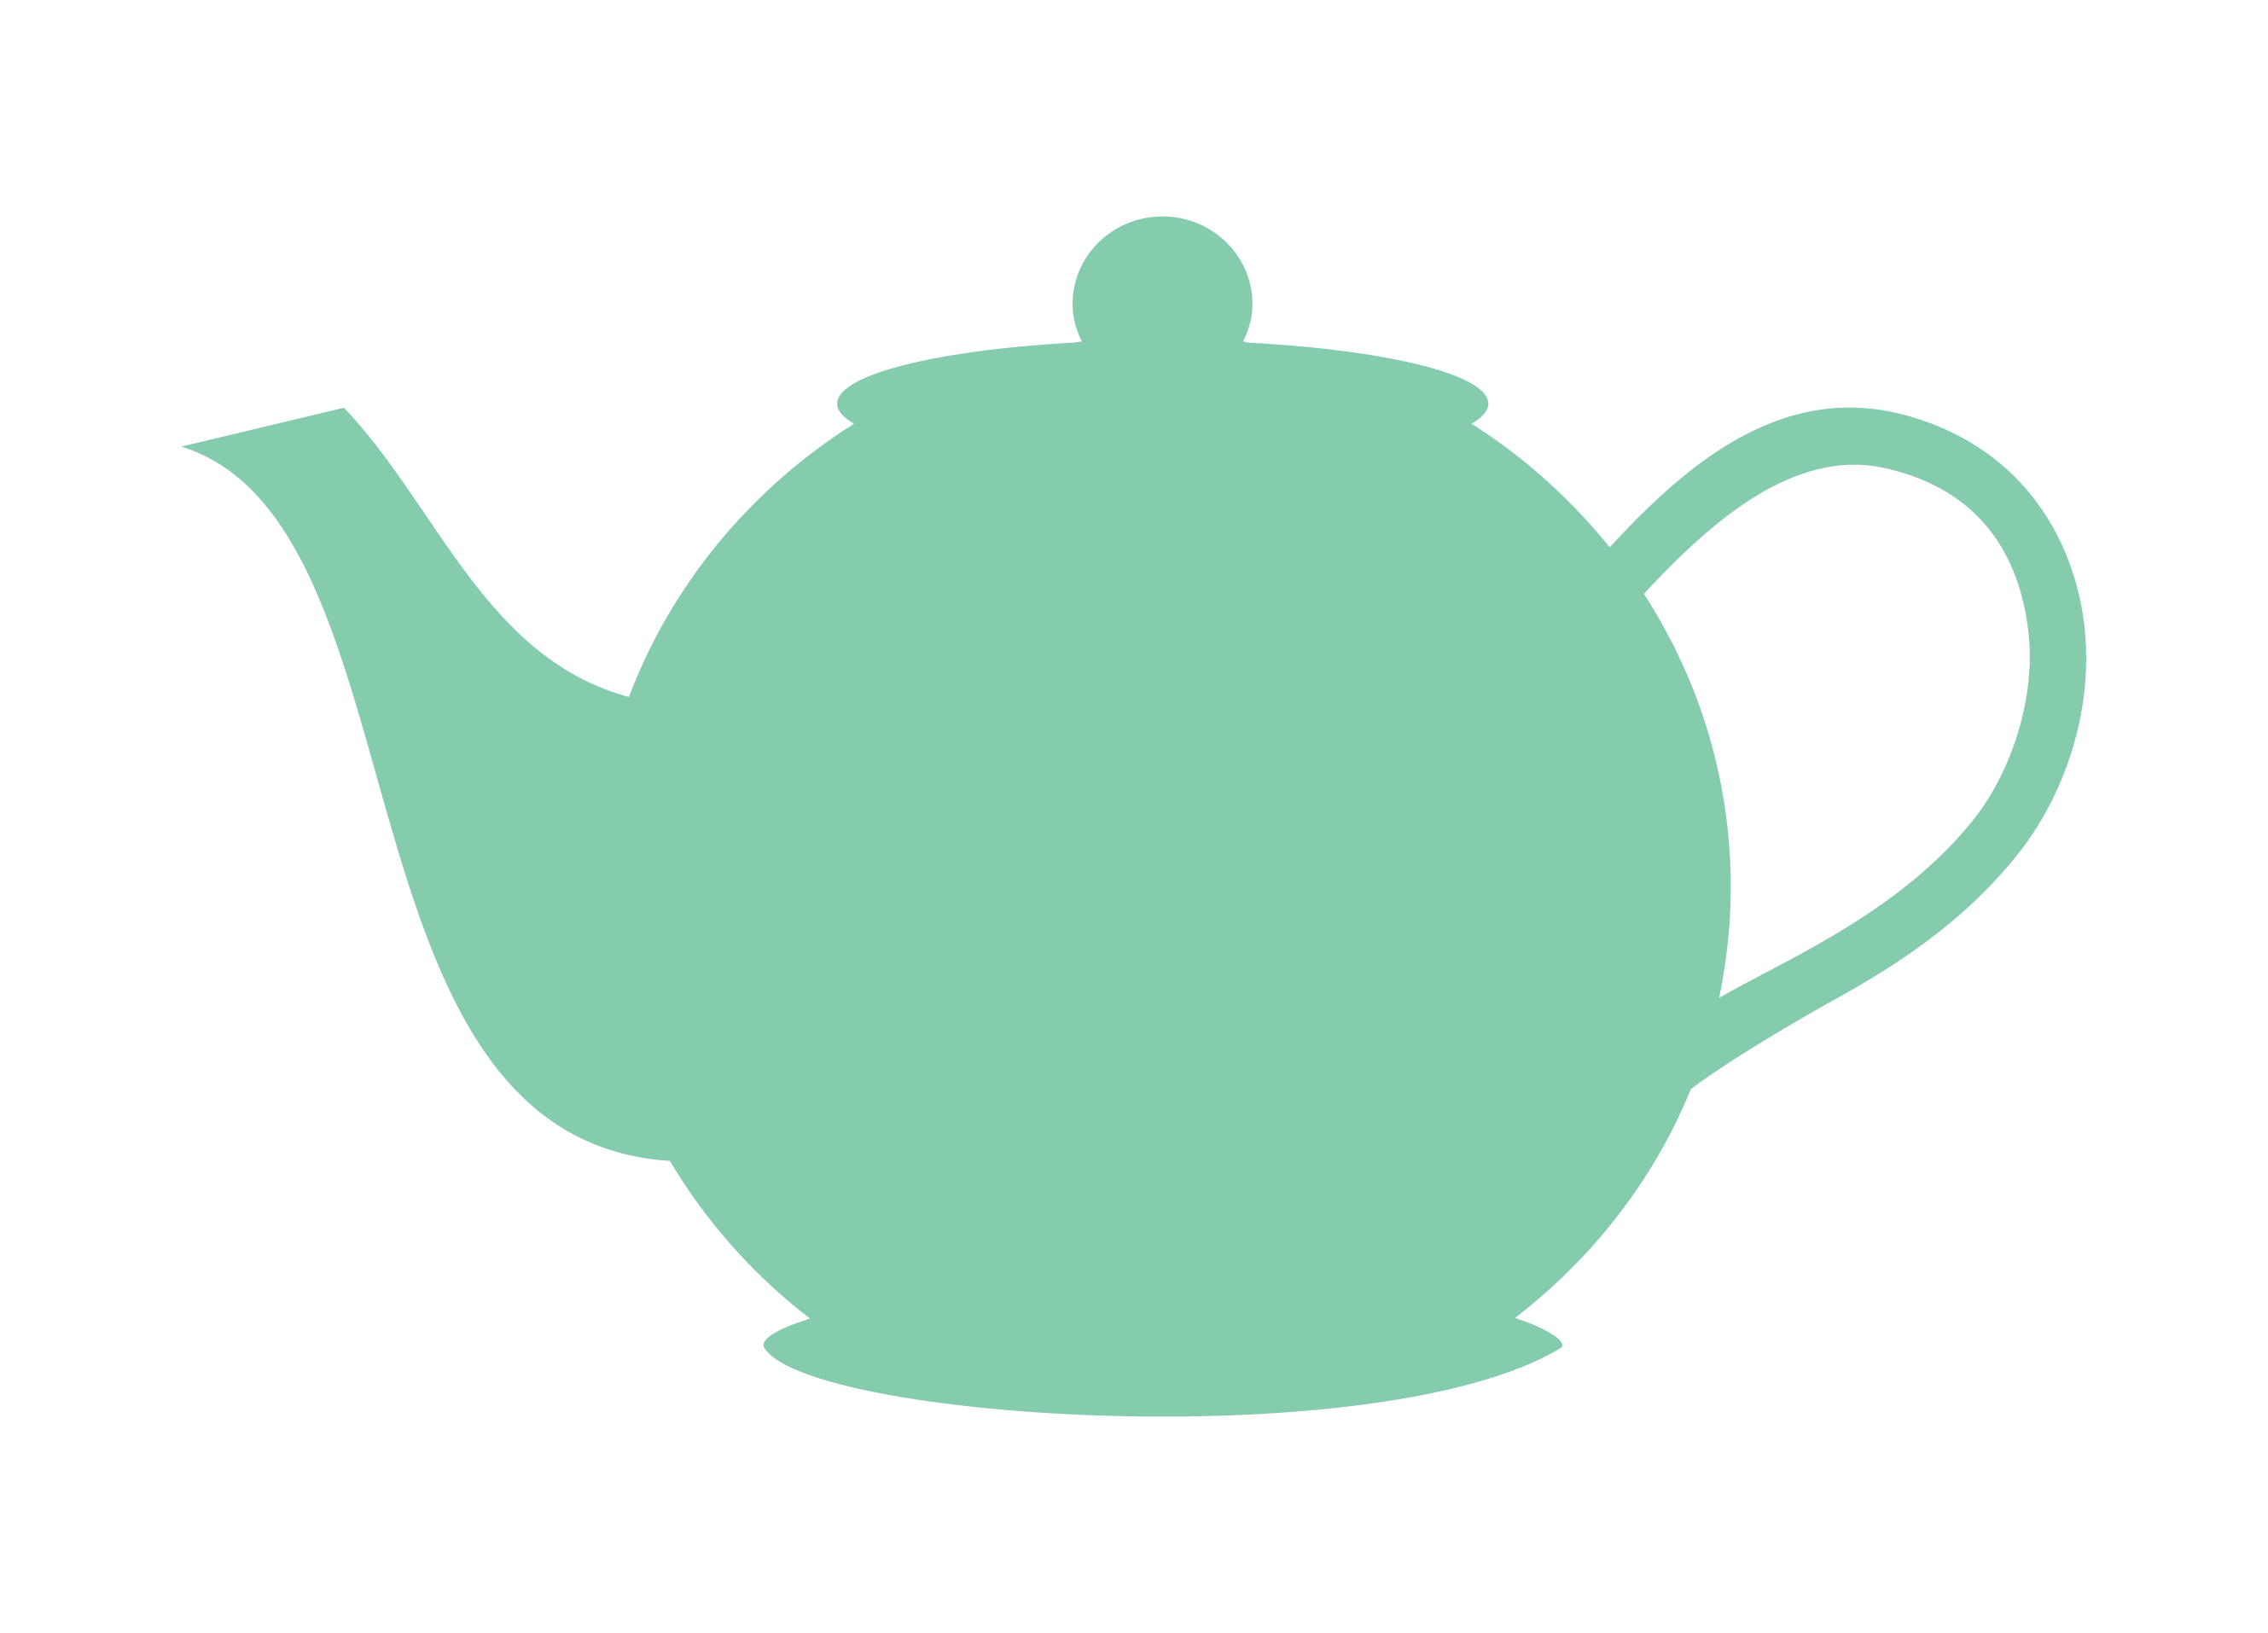 Kitchen utensil clip art - Tea Pot Clipart Cliparts Co